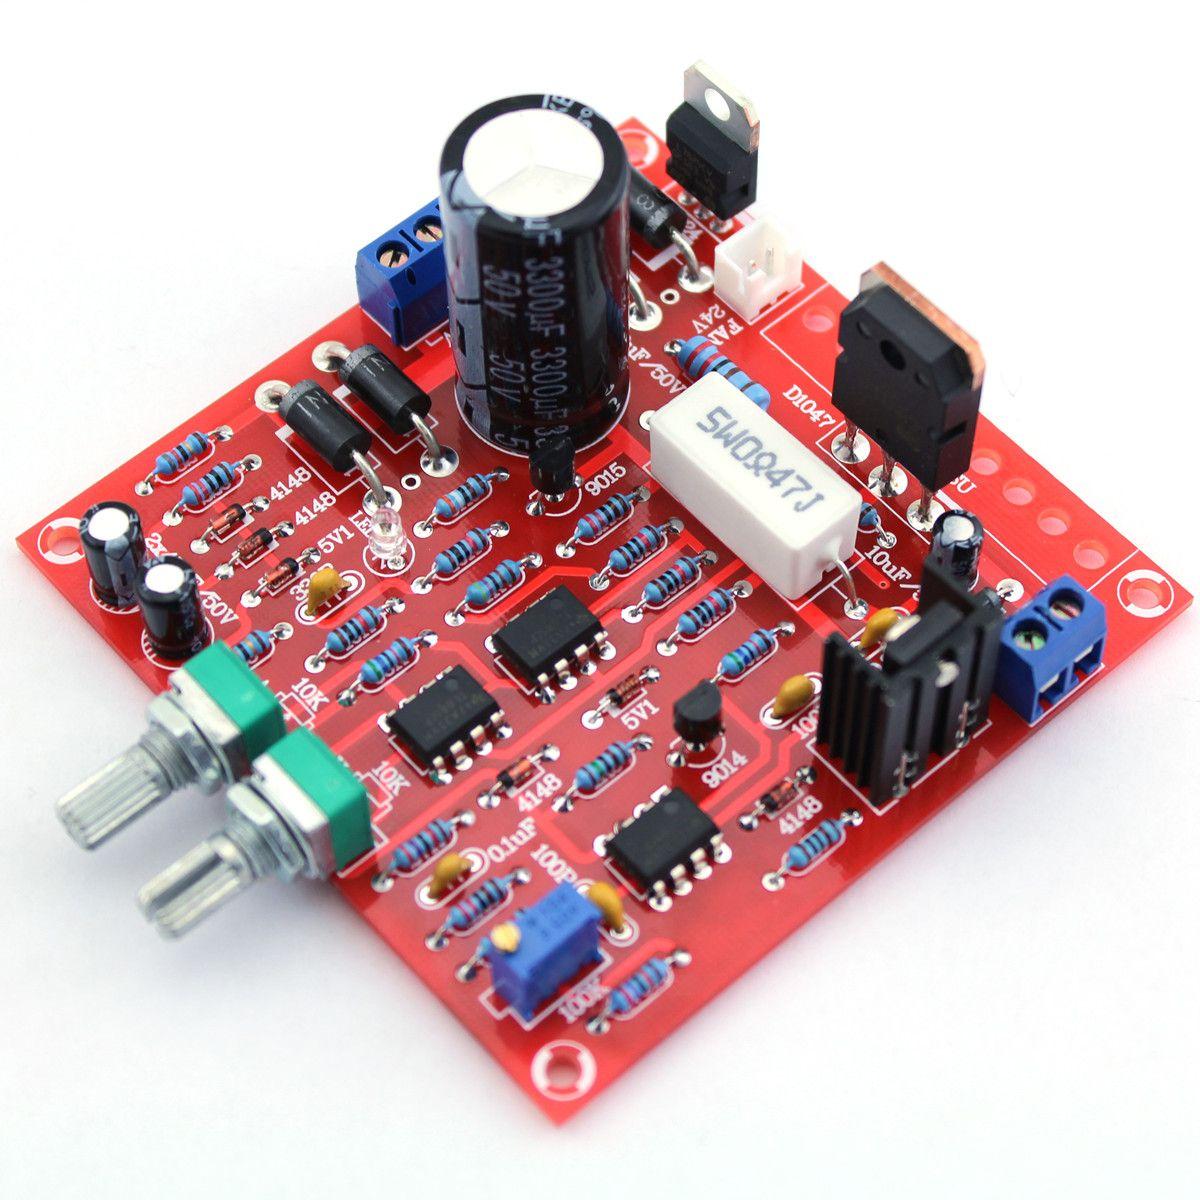 030V 2mA 3A Adjustable DC Regulated Power Supply DIY